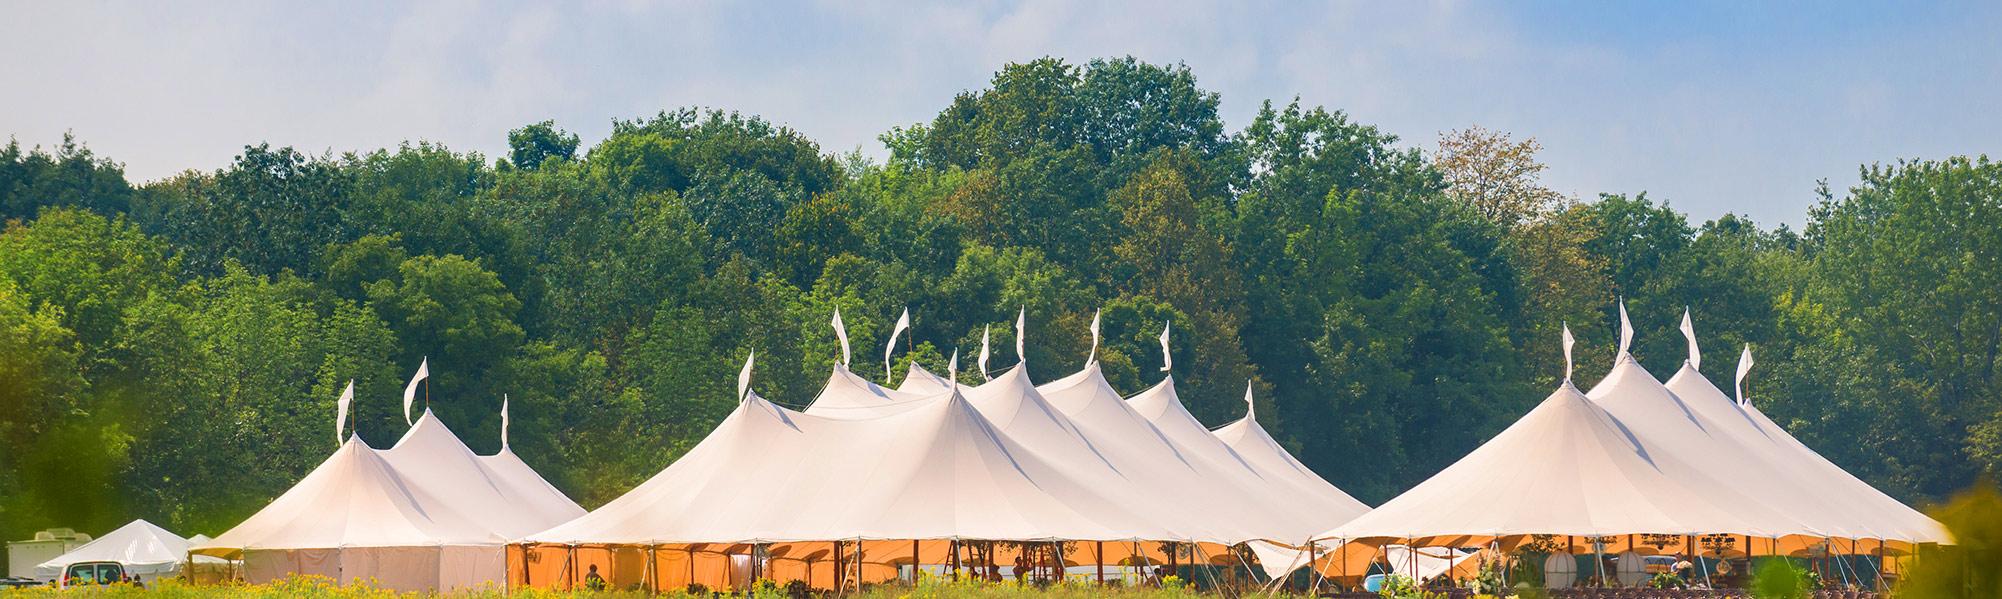 Hank Parker S Amp All Season Party Amp Tent Rental Buffalo